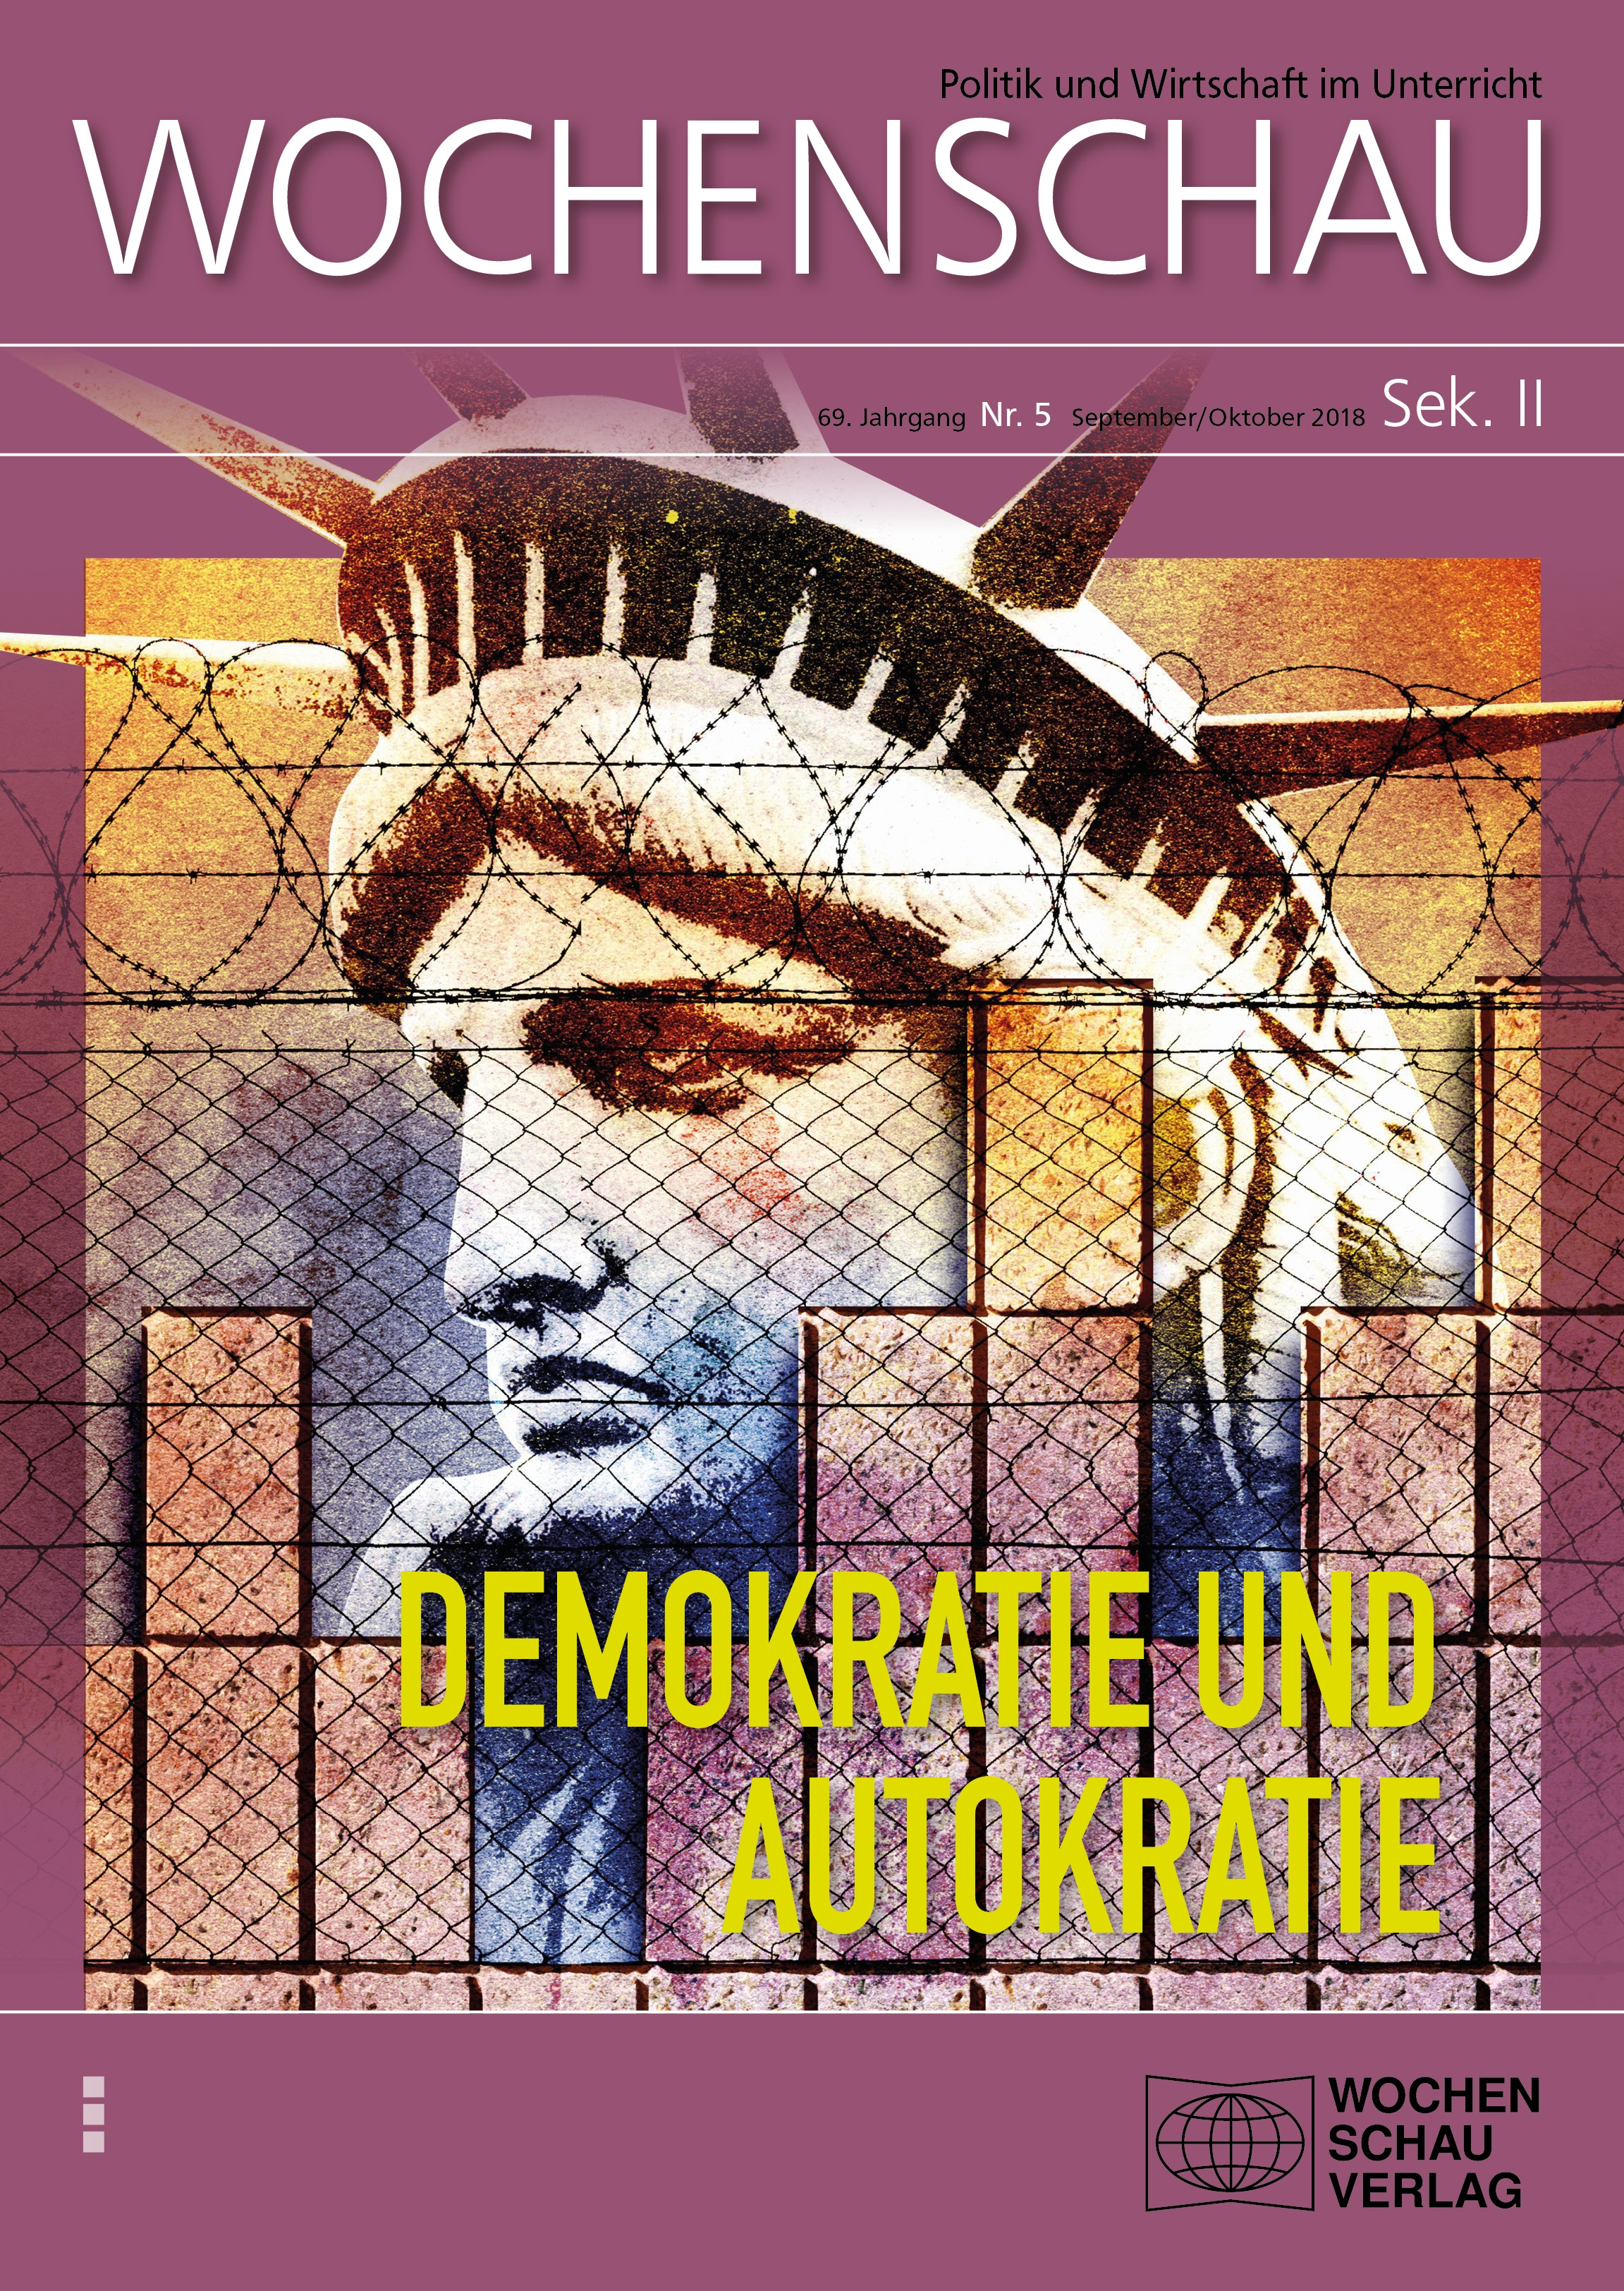 Demokratie, Autokratie, Autoritarismus, Totalitarismus, Demokratietheorie, Herrschaft, Nationalismus, Populismus, Überwachung, Gewaltenteilung, Rechtsstaatlichkeit